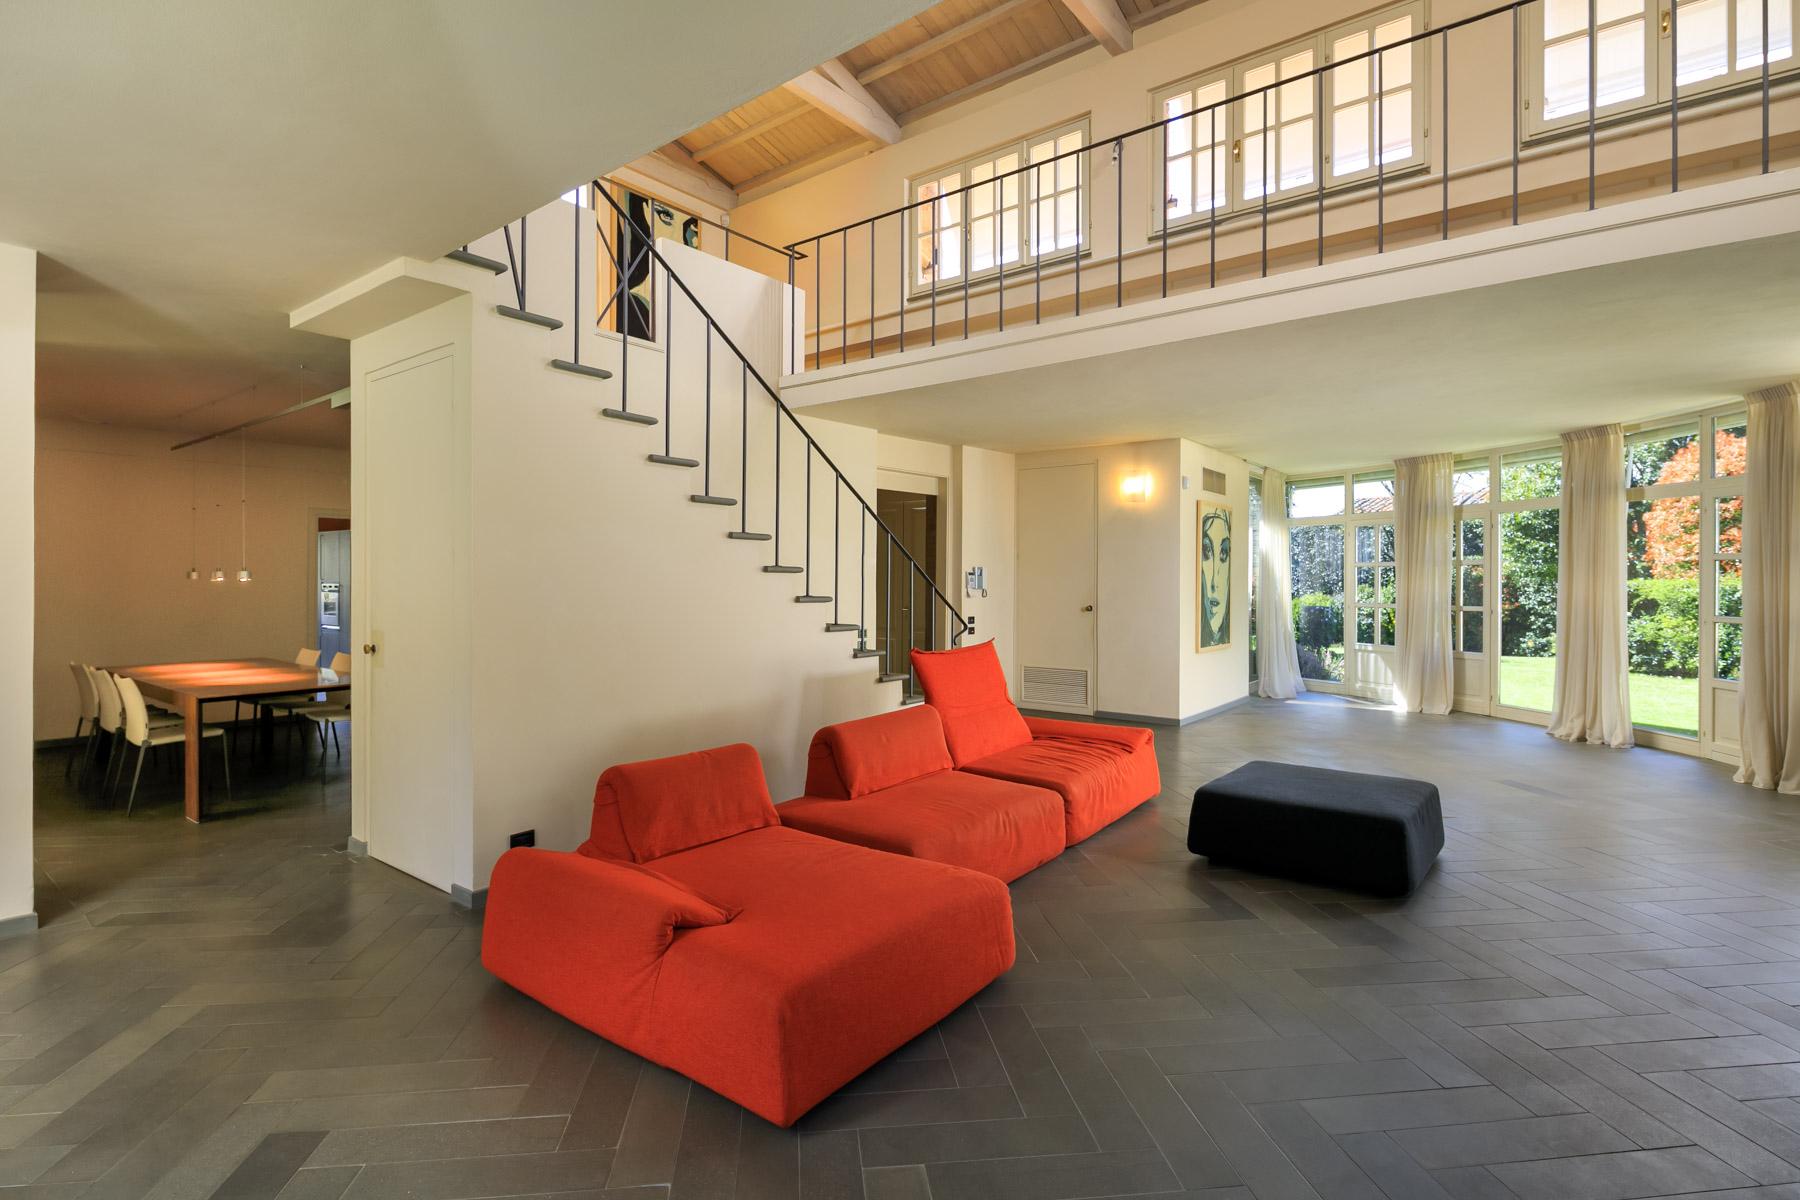 Villa in Vendita a Lucca: 5 locali, 500 mq - Foto 13